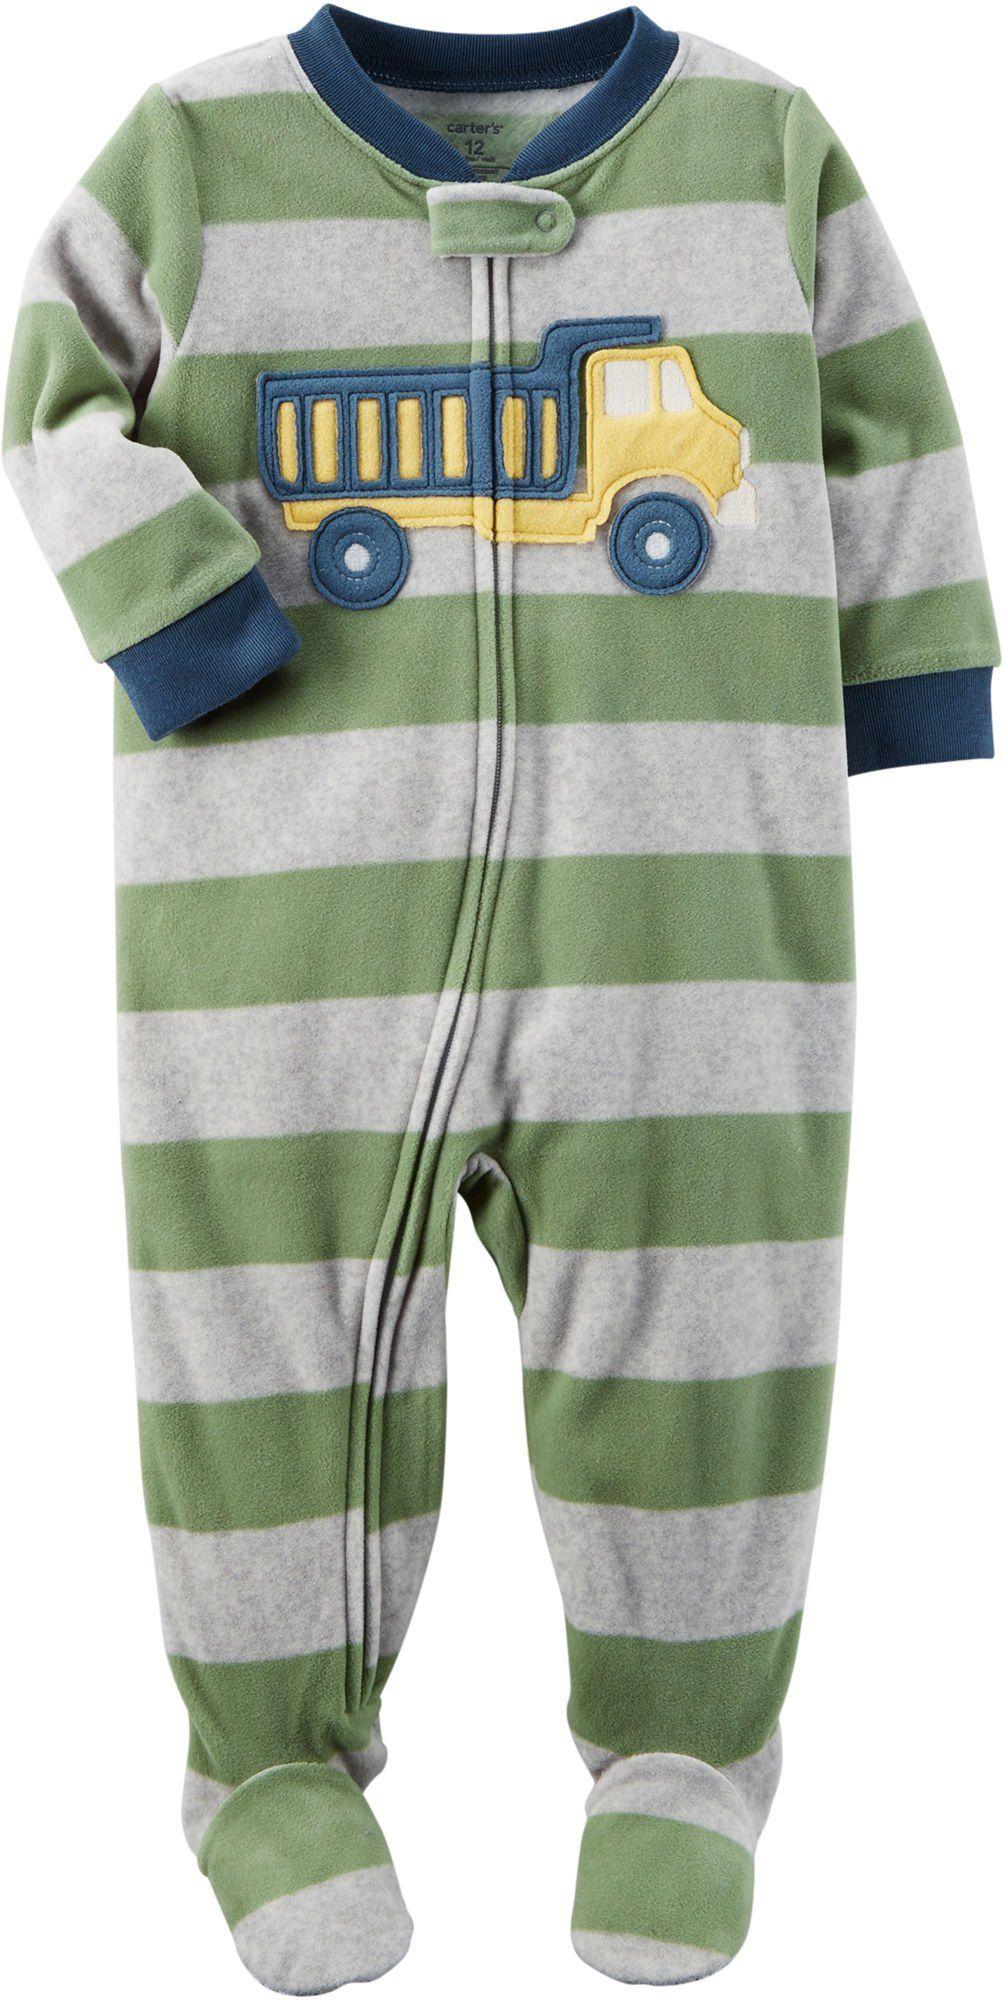 fe544ffe0e09 Carters Boys 12M8 One Piece Striped Truck Fleece Pajamas Green 18 ...